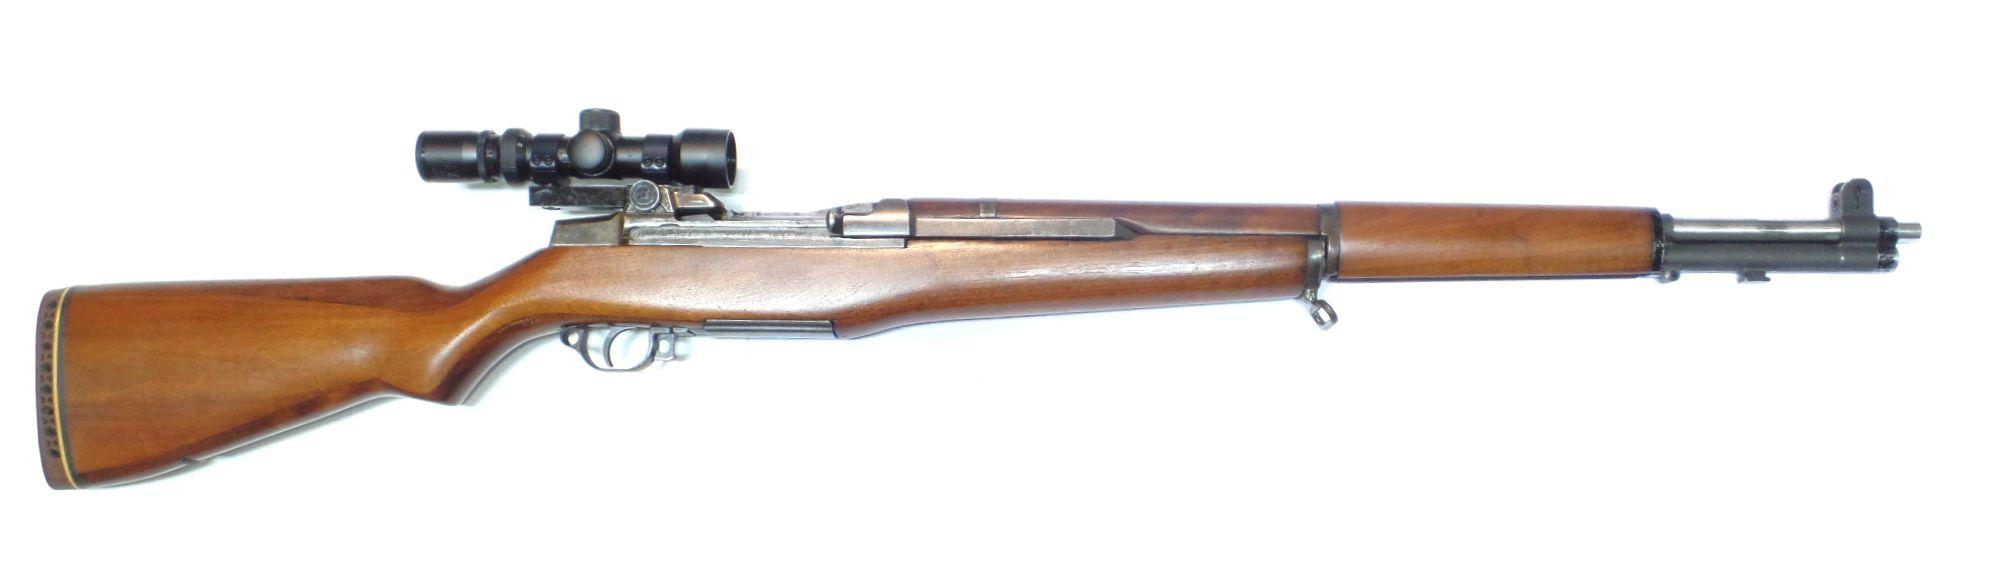 GARAND M1 calibre .270Winchester